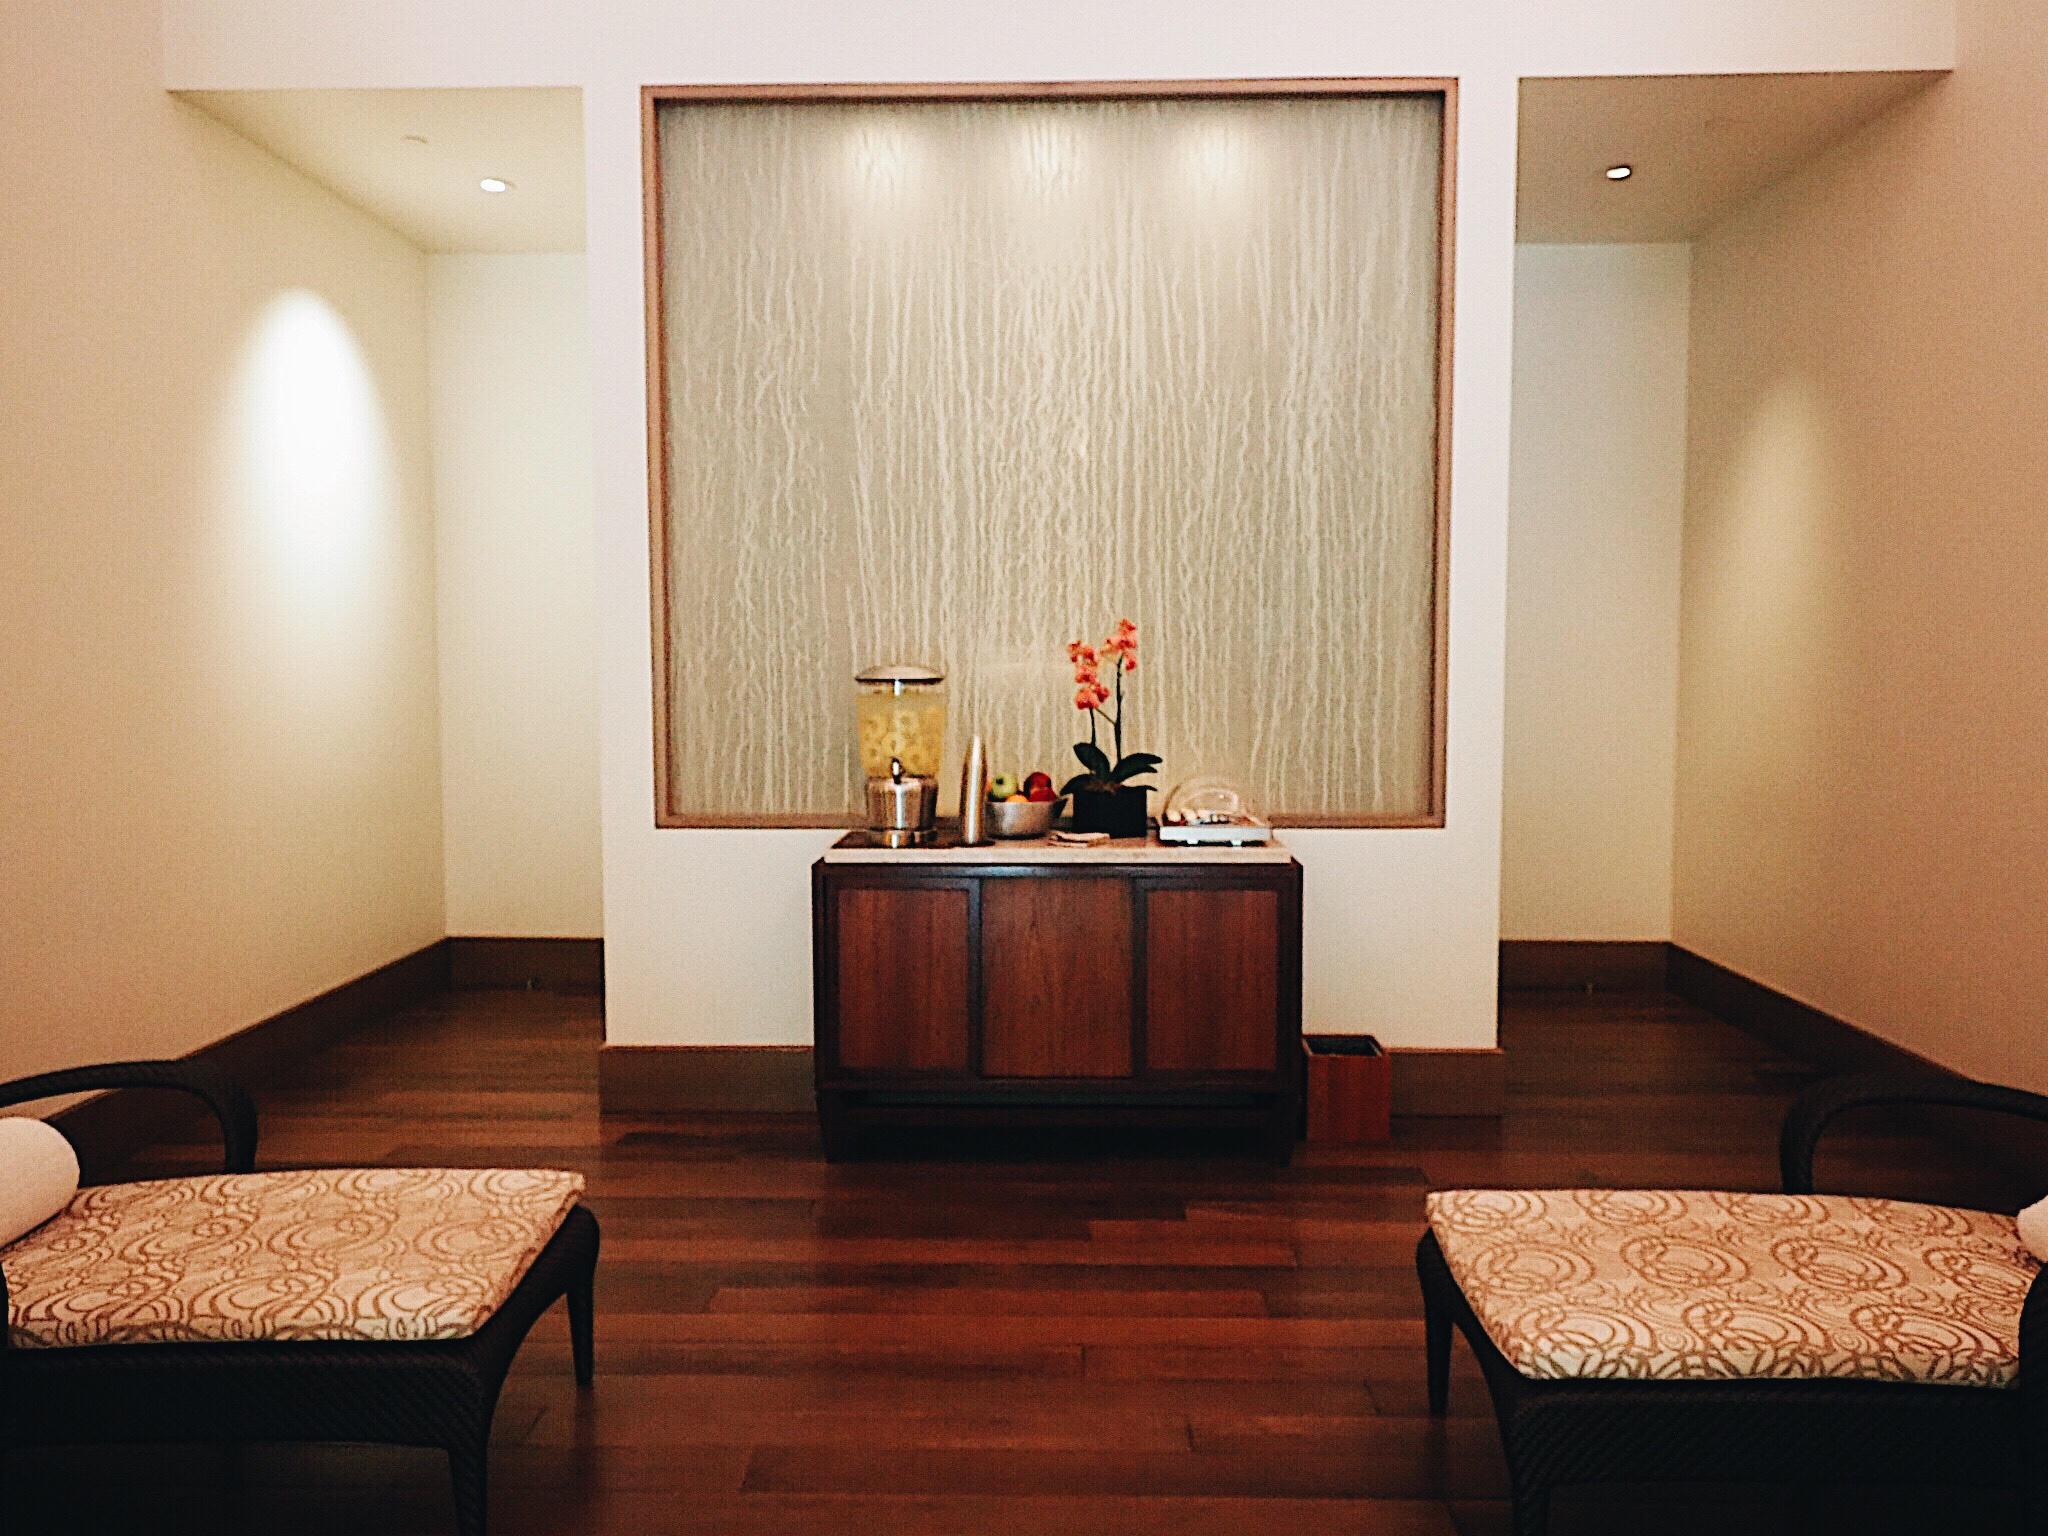 c3cb3e47 1732 4701 b651 dad8590ff44e - Aulani, A Disney Resort & Spa  -  大人だけの空間 LANIWAI SPAでの至福の時間